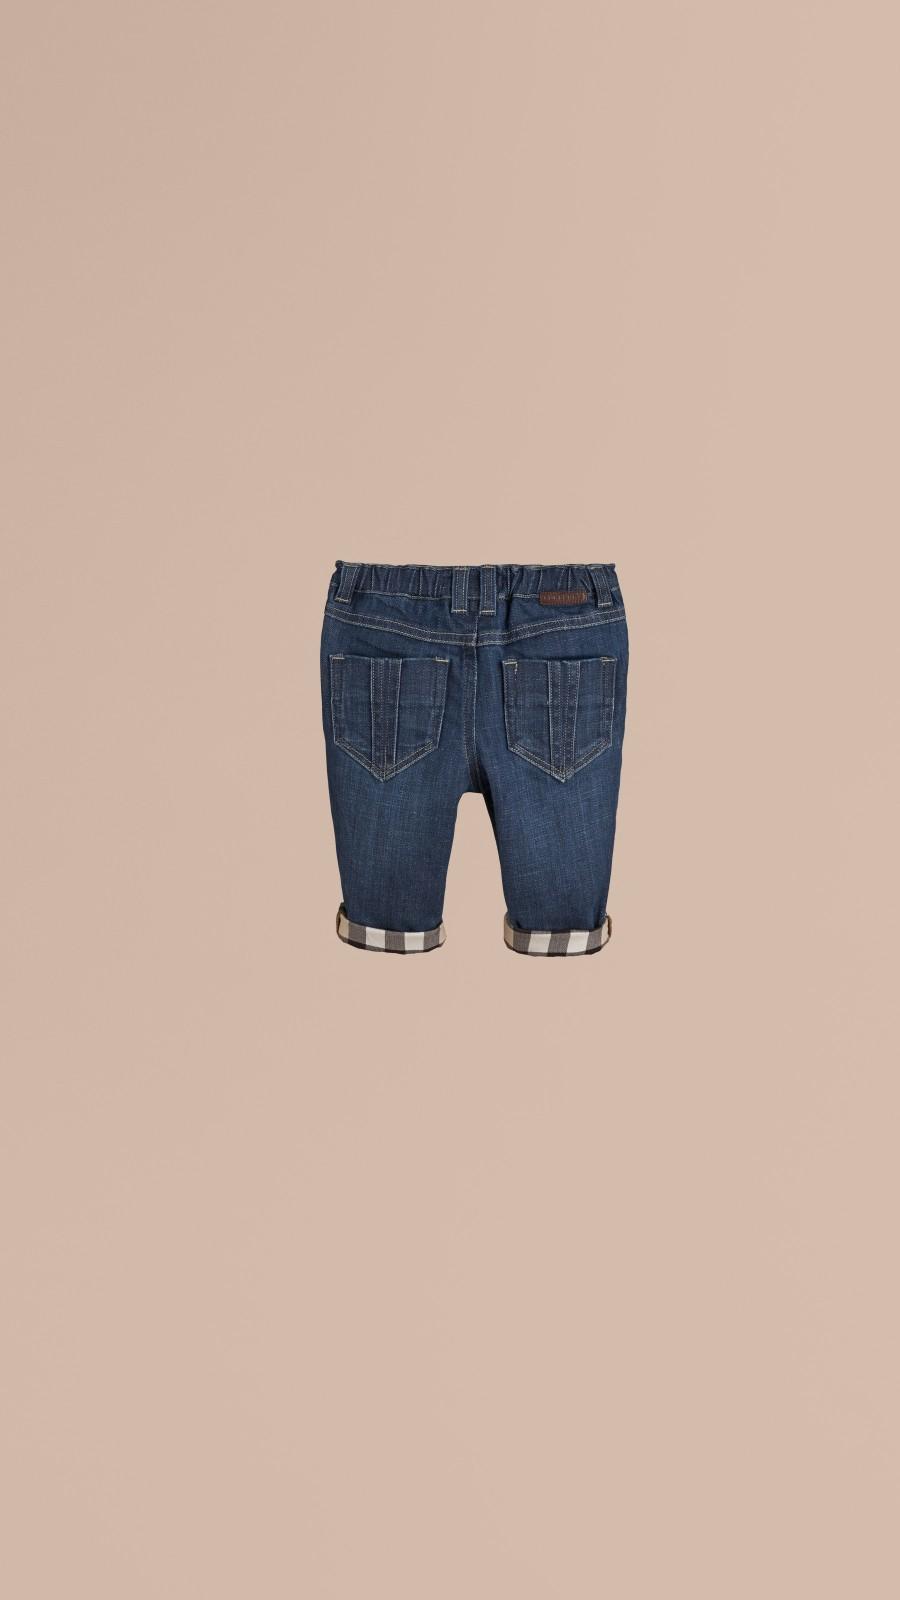 Blue Stretch Denim Jeans - Image 3